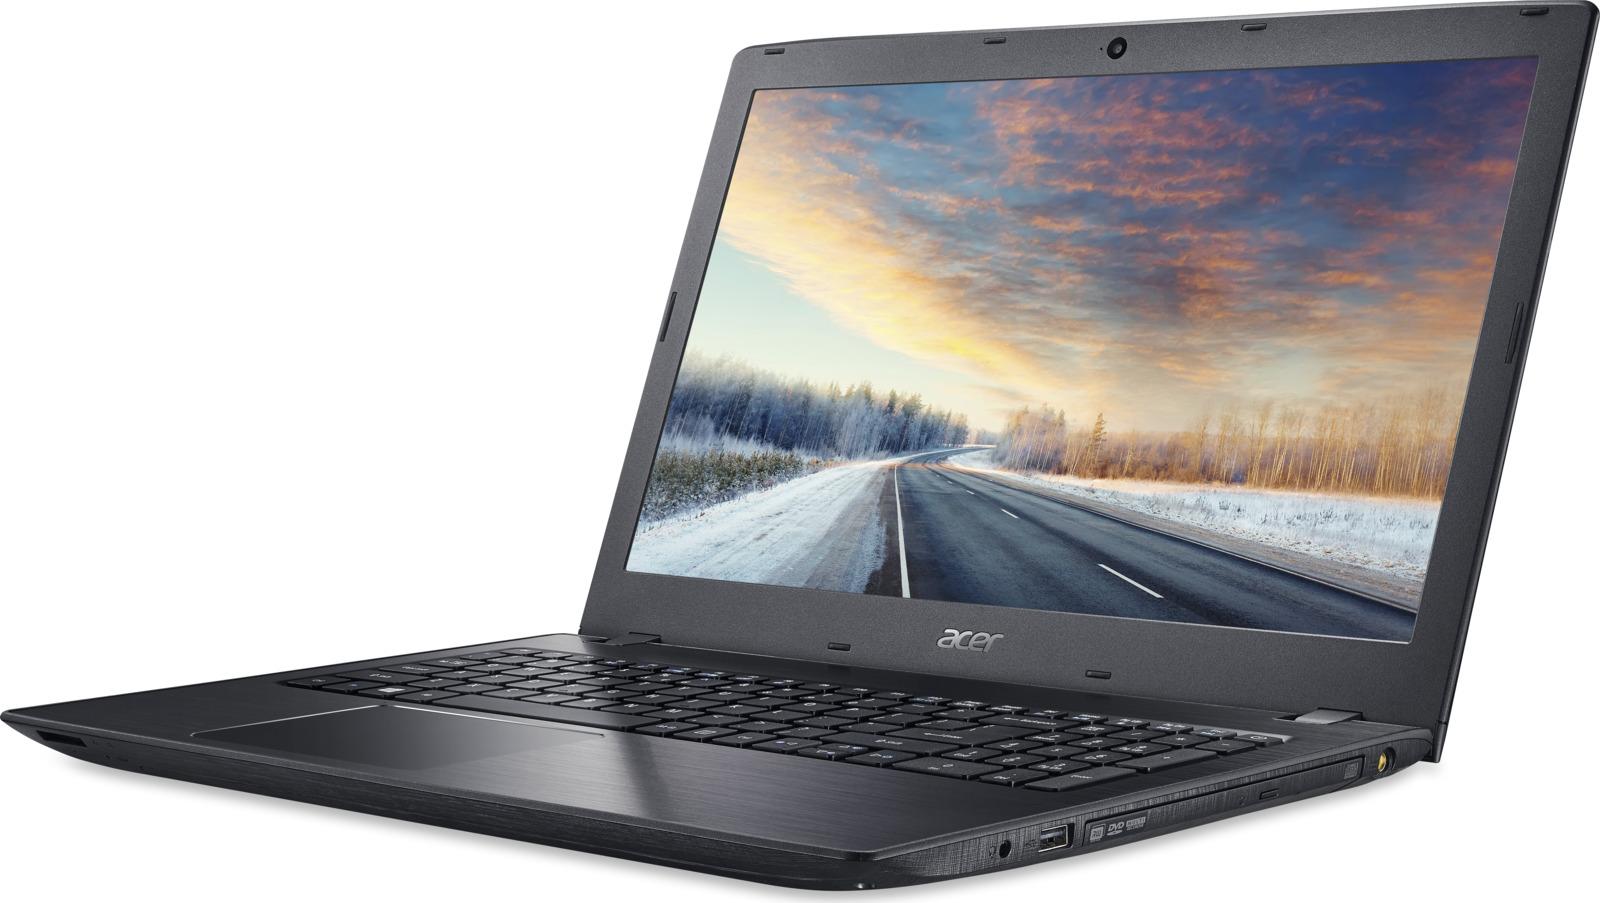 Ноутбук Acer TravelMate TMP259-MG, NX.VE2ER.035, 15.6, черный ноутбук 10 дюймов